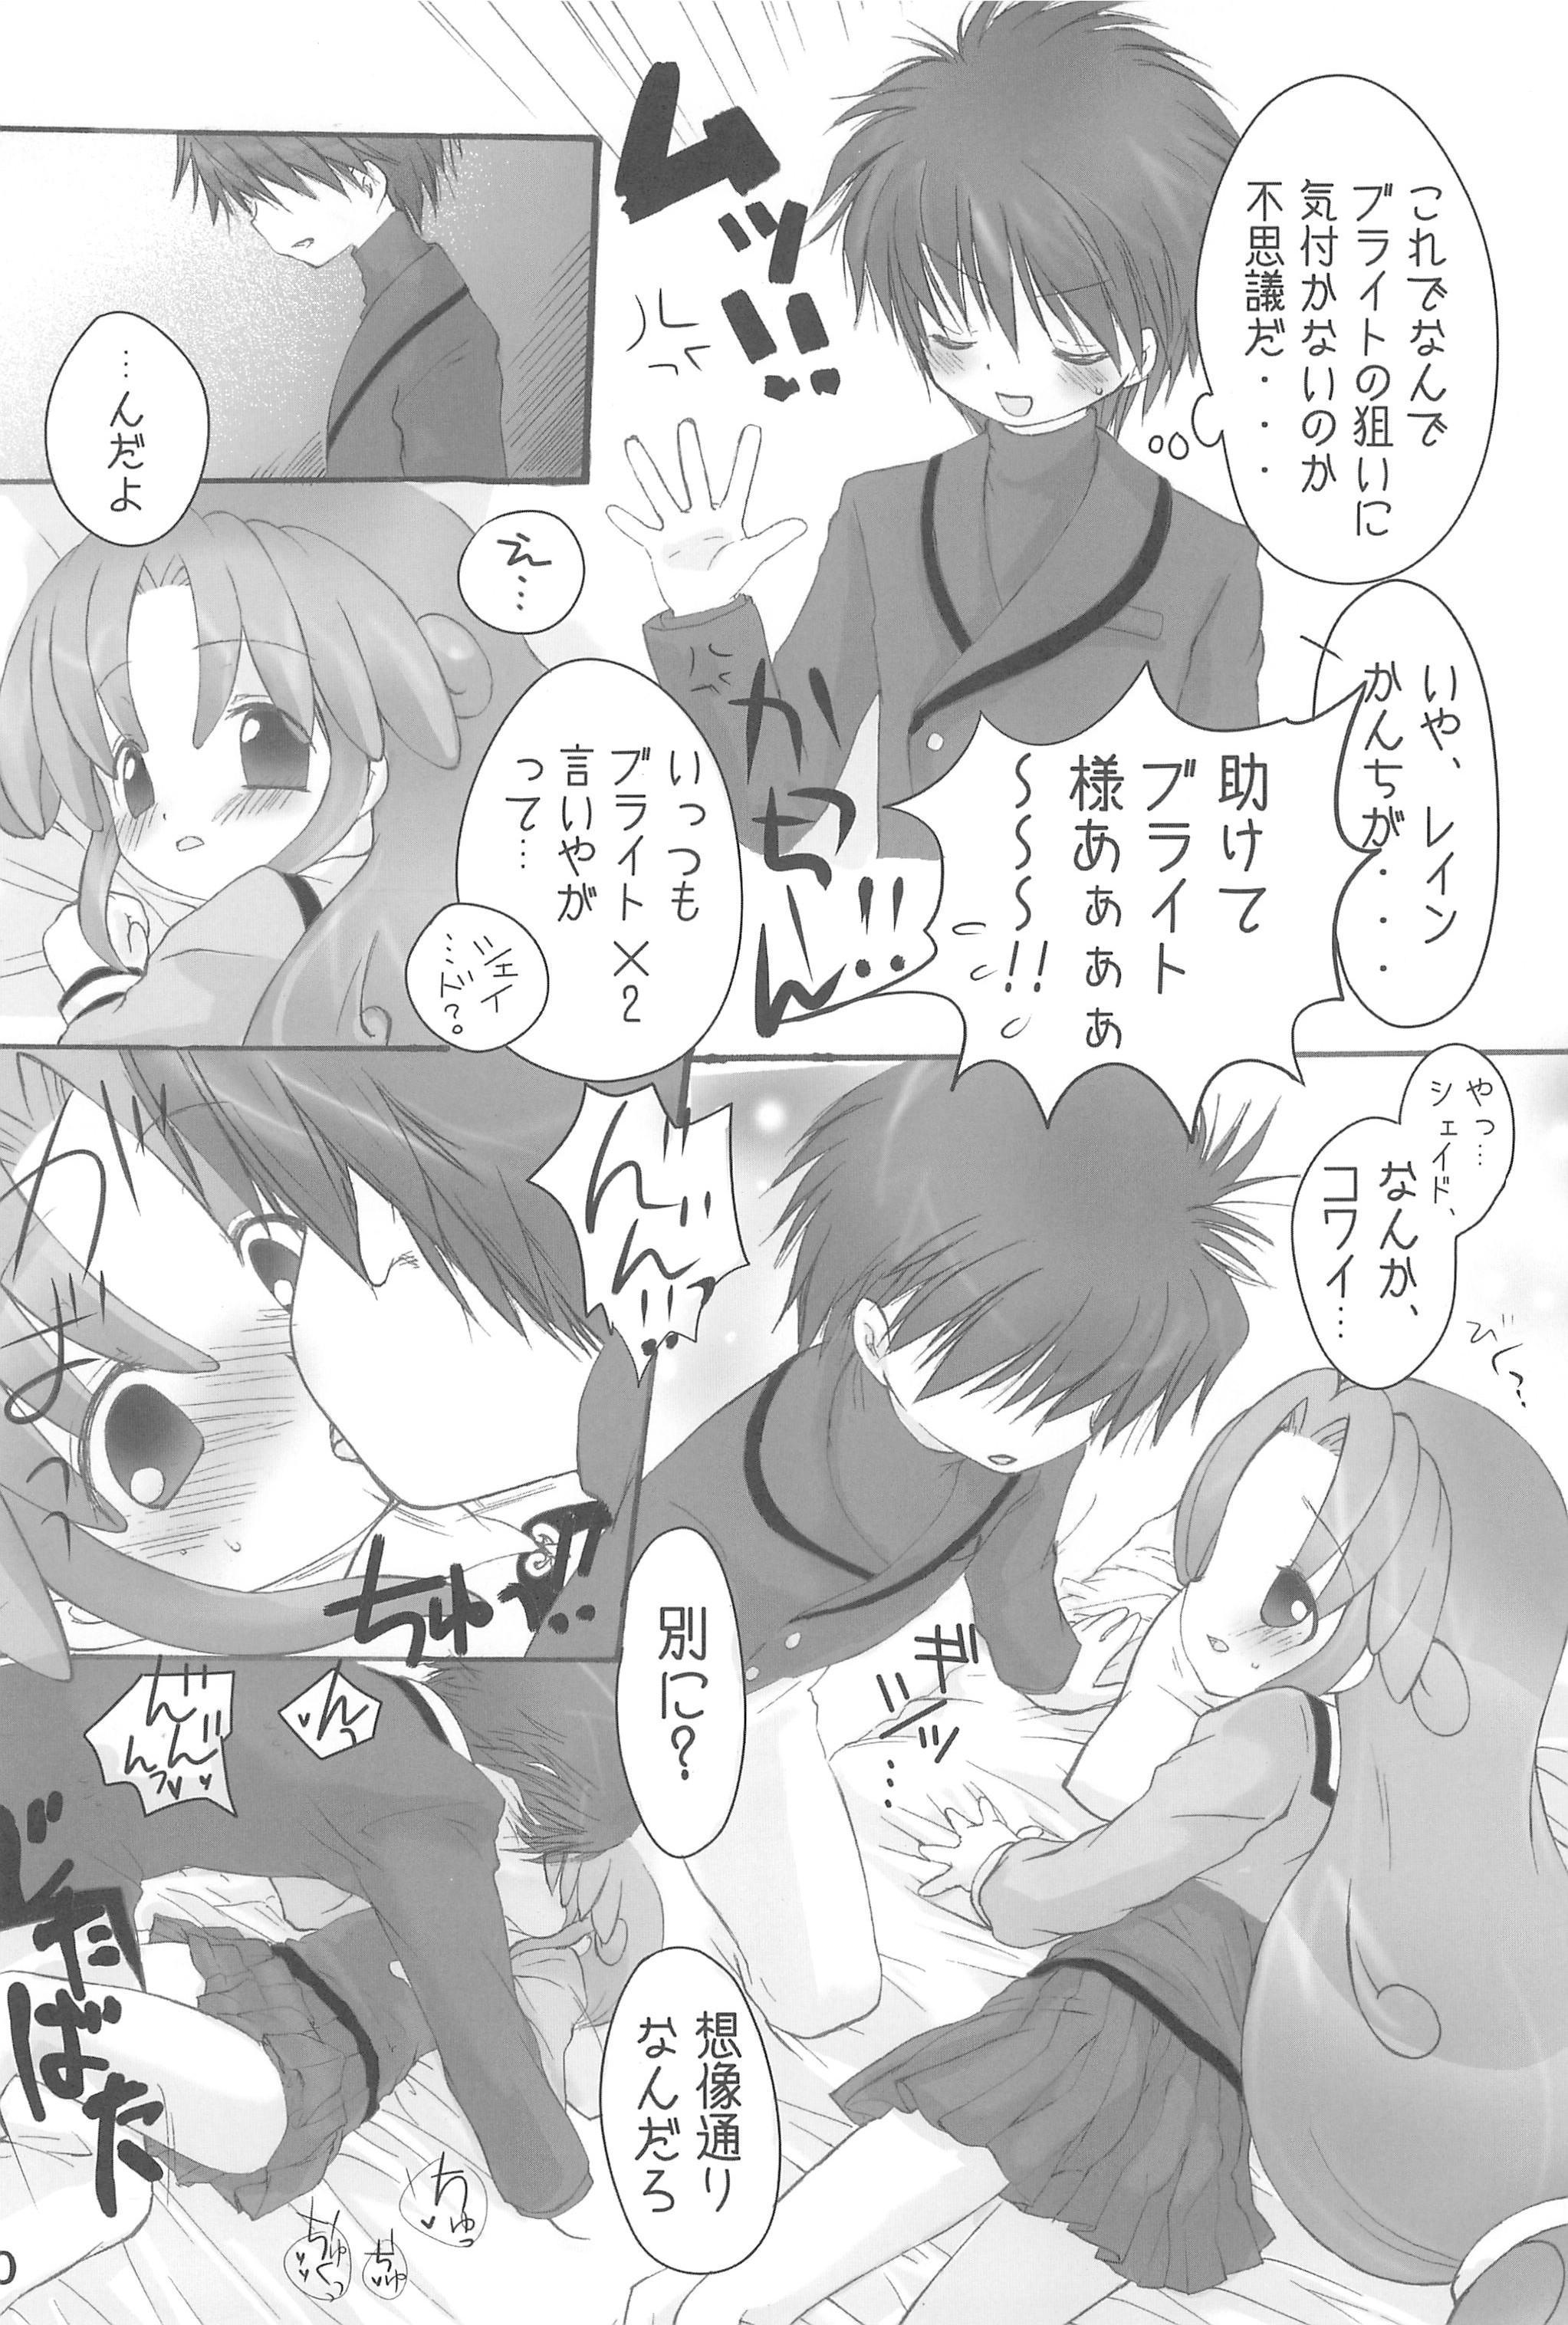 Rein-sama, Goyoujin! 9